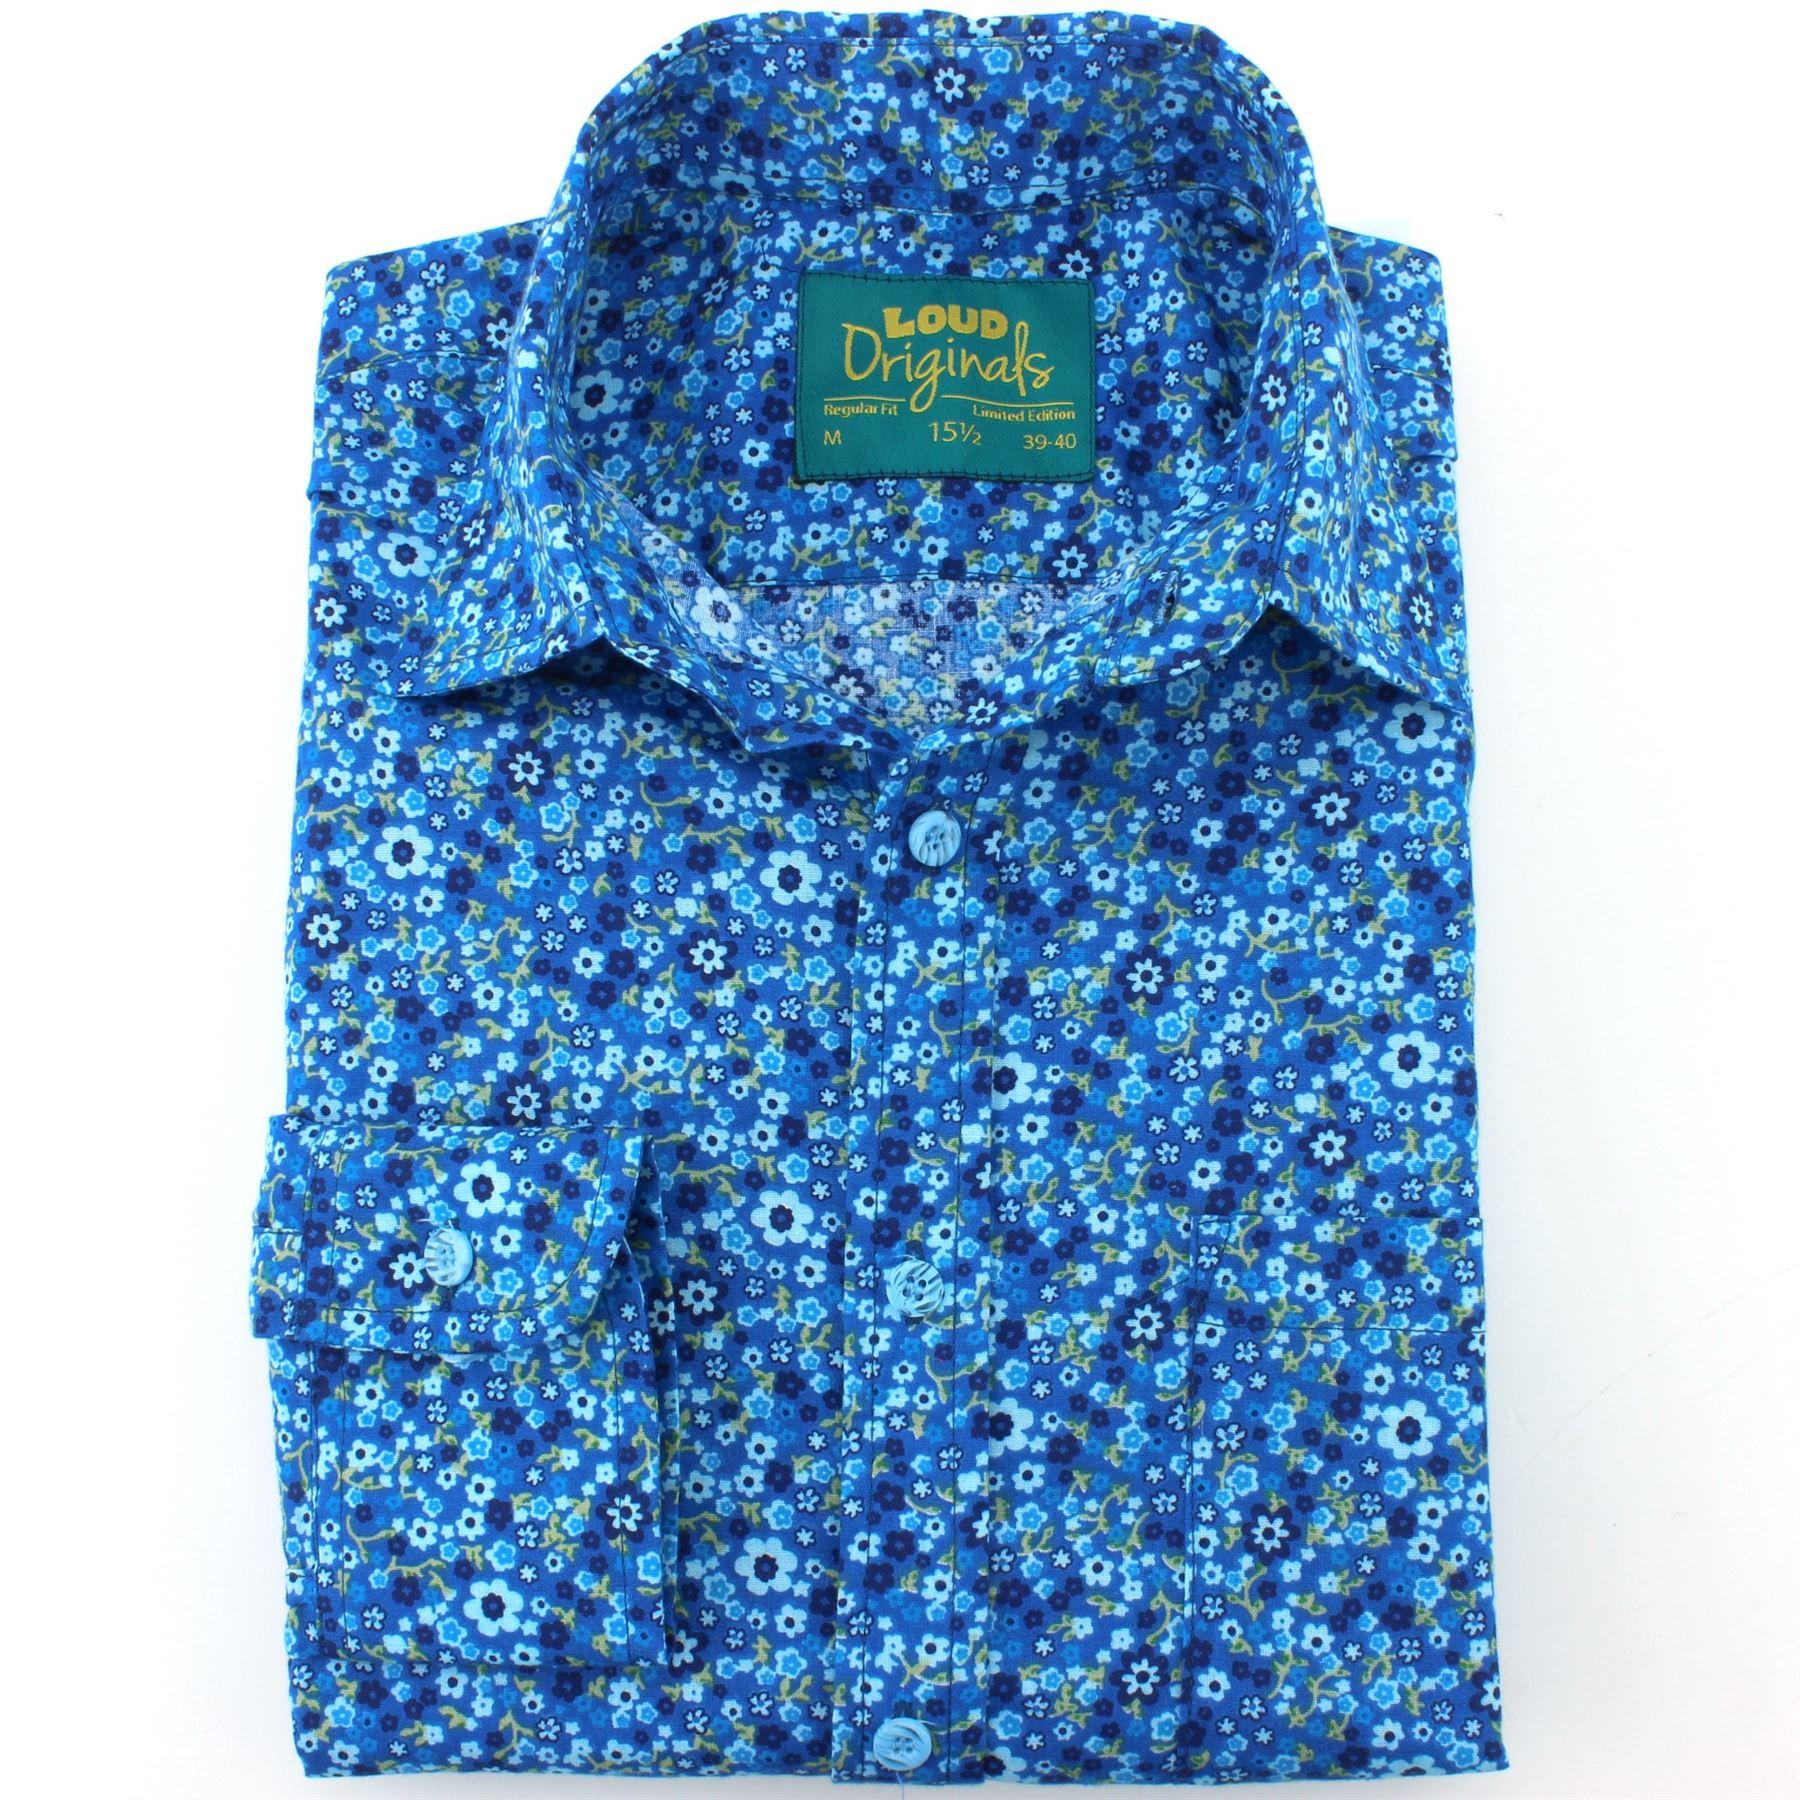 Mens Shirt Loud Originals REGULAR FIT Floral Ditzy Retro Psychedelic Psychedelic Psychedelic Fancy  | Erste Klasse in seiner Klasse  6c7041